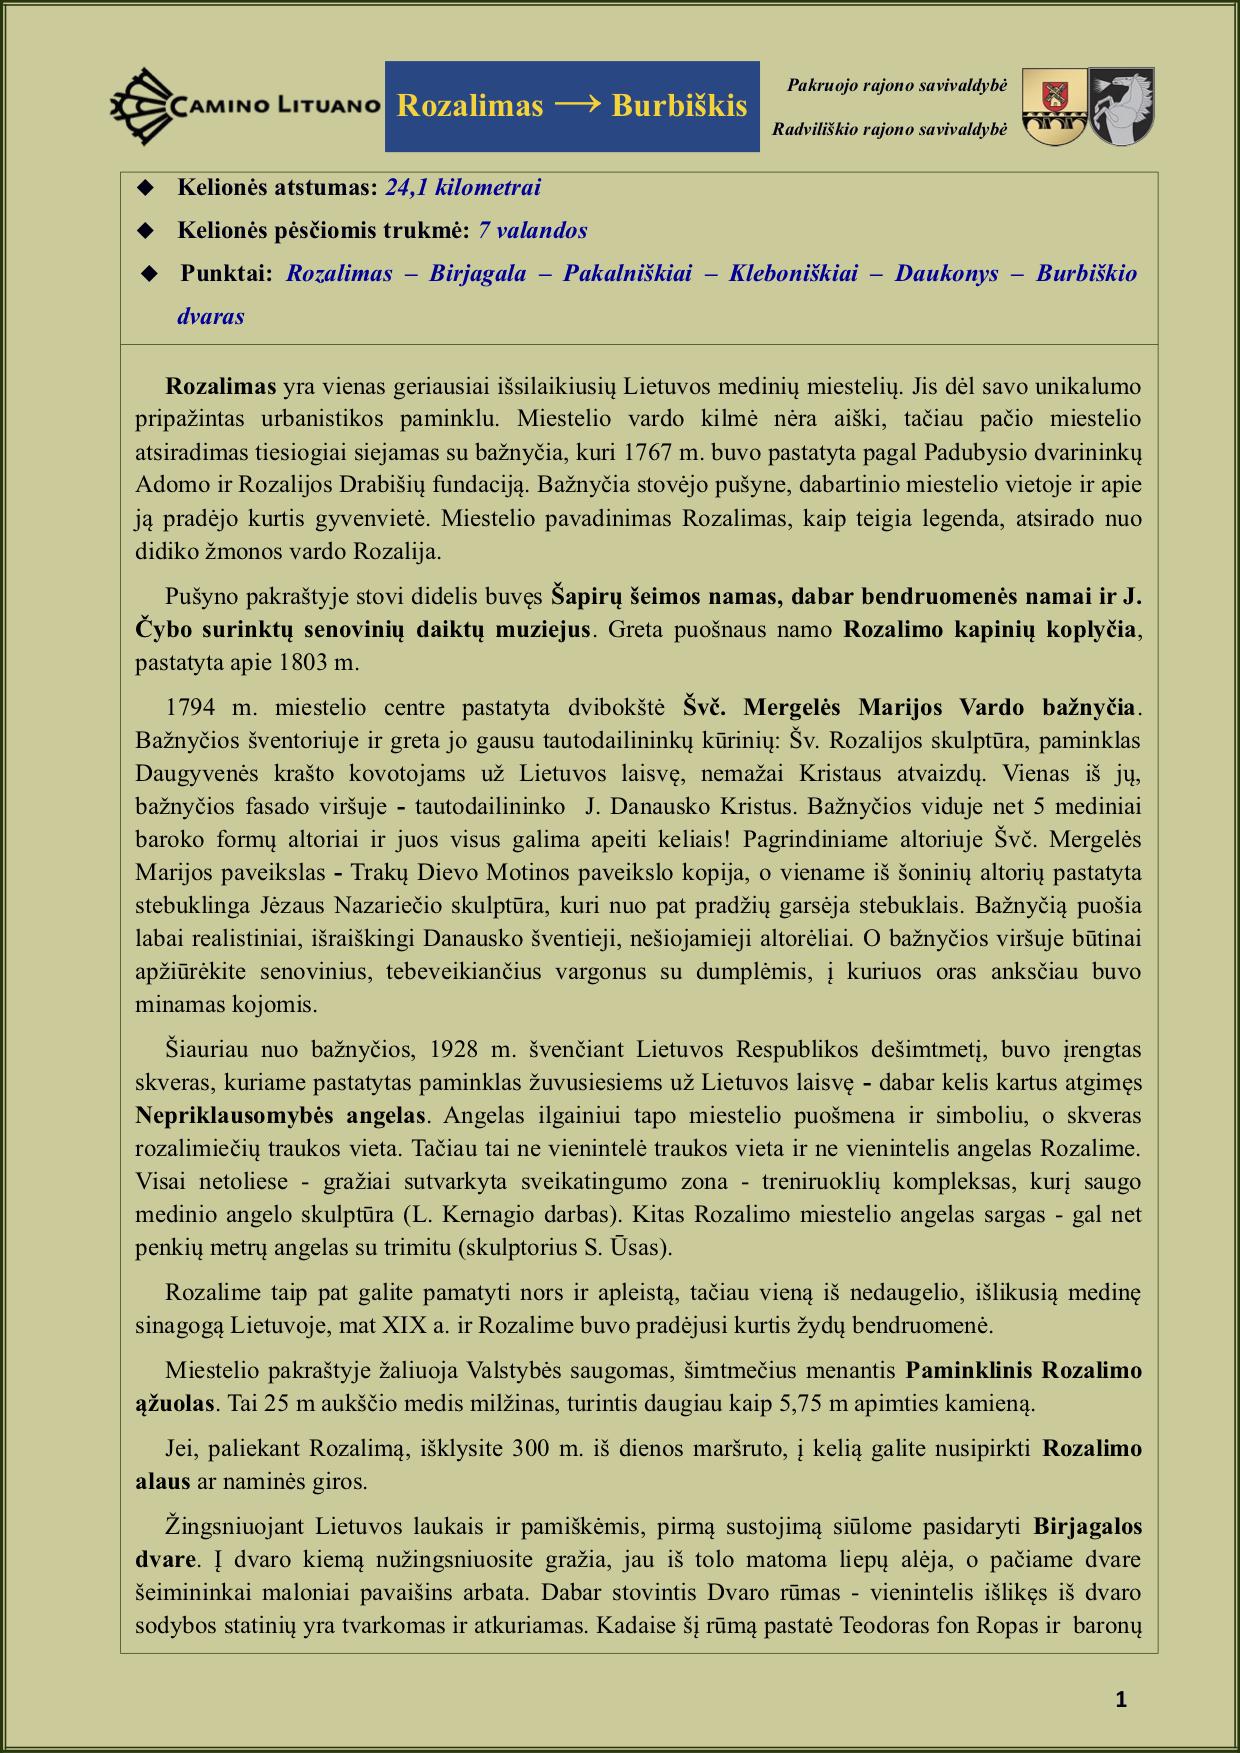 Rozalimas-Burbiskis_GIDAS_1_v2(prod)